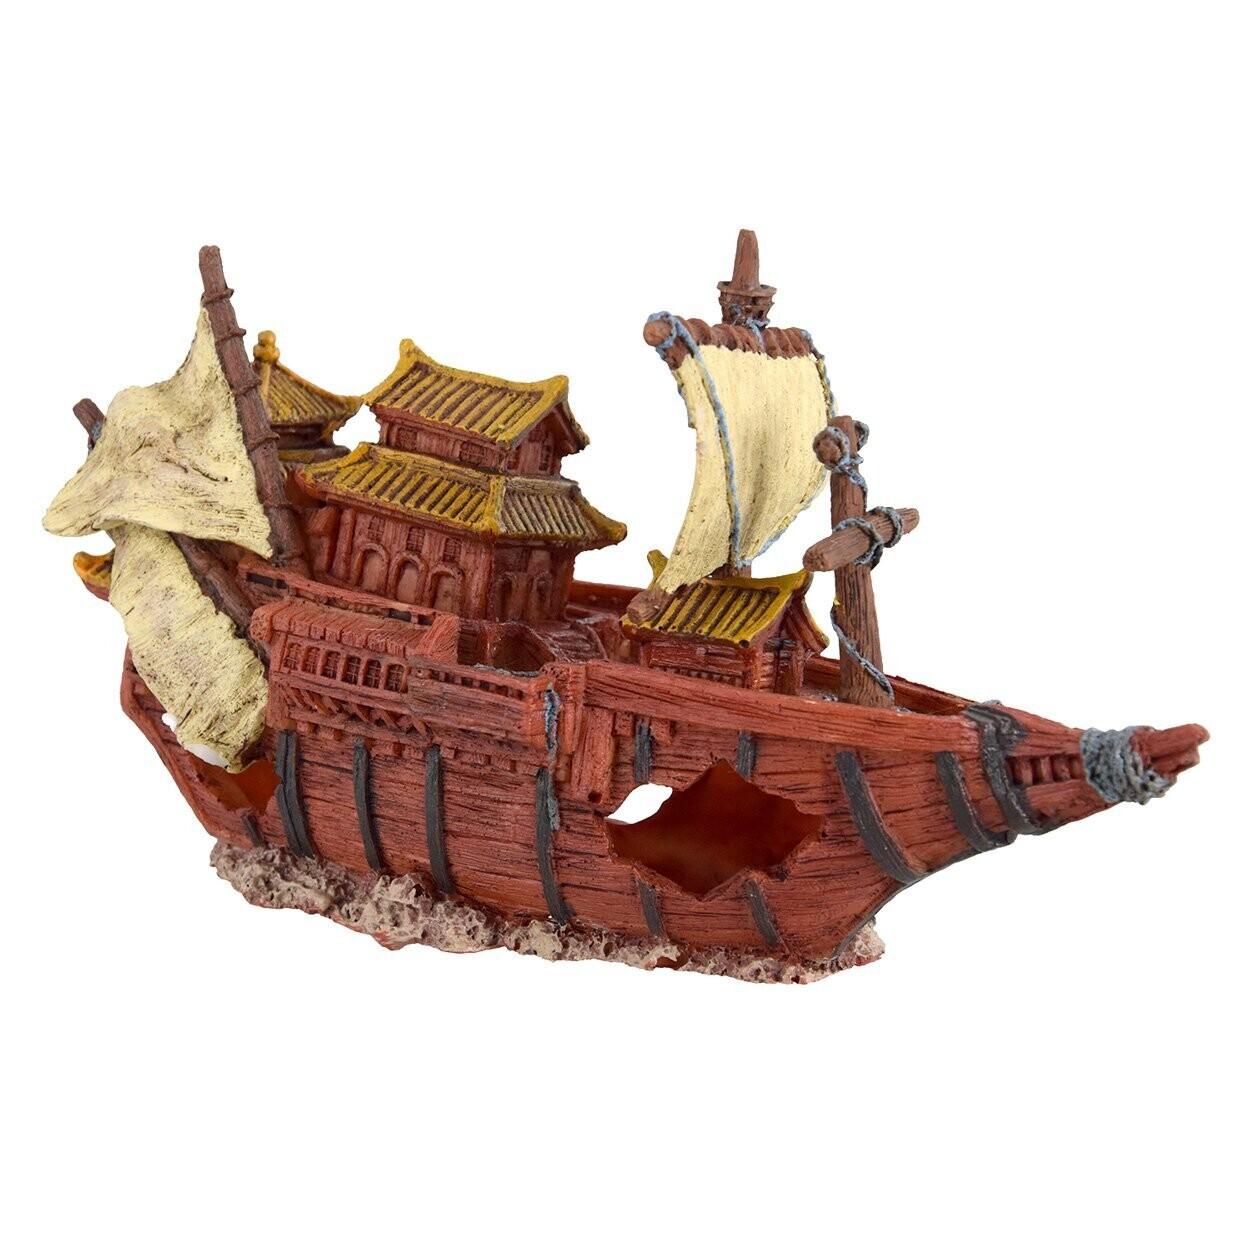 Underwater Treasures Junk Ship